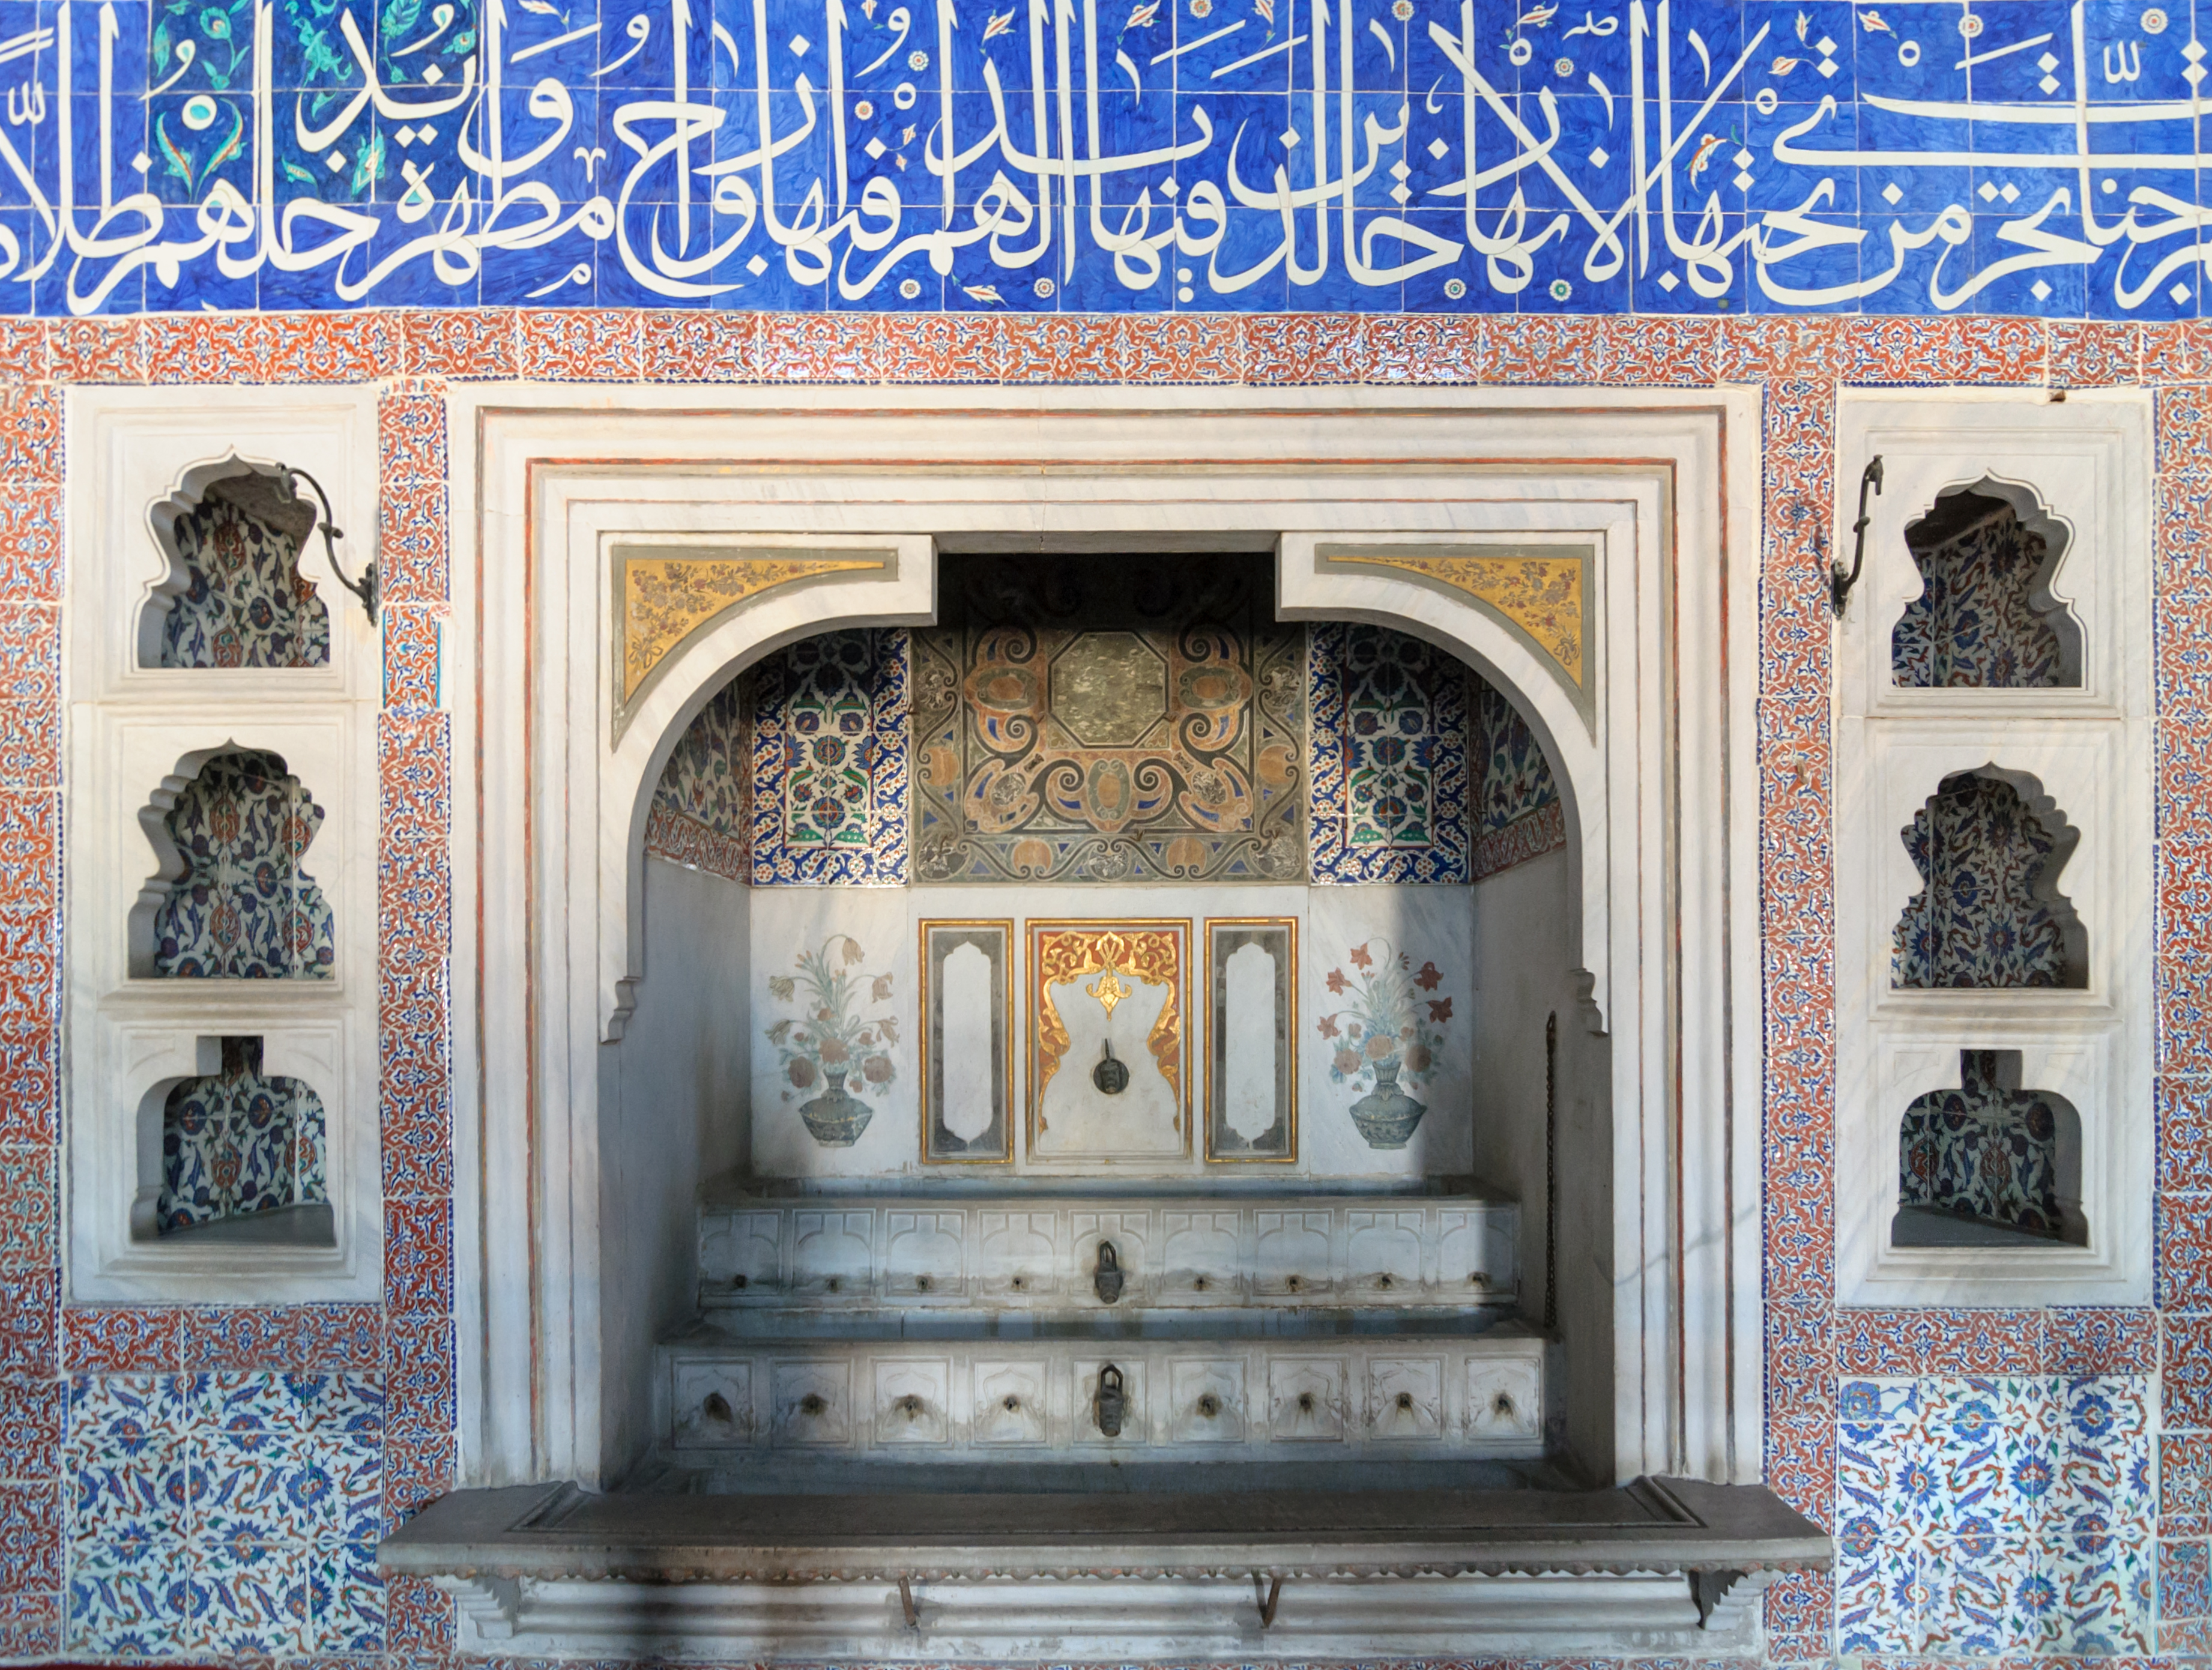 Fichier:Fontaine chambre Murad III harem palais Topkapi.jpg — Wikipédia